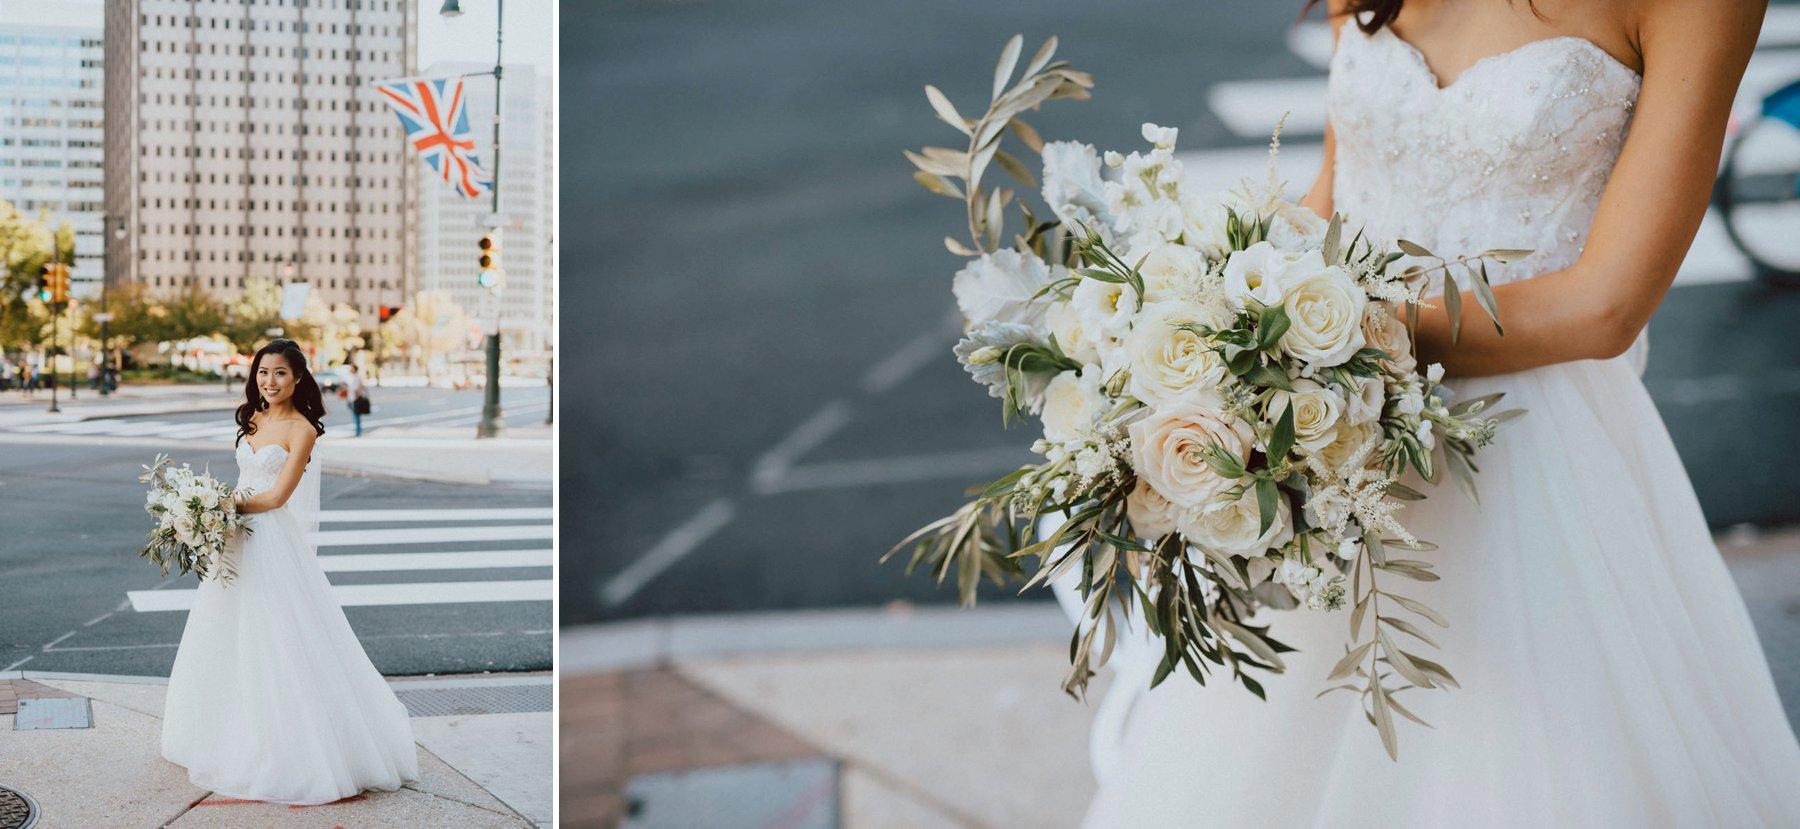 philadelphia-wedding-photographer-29.jpg